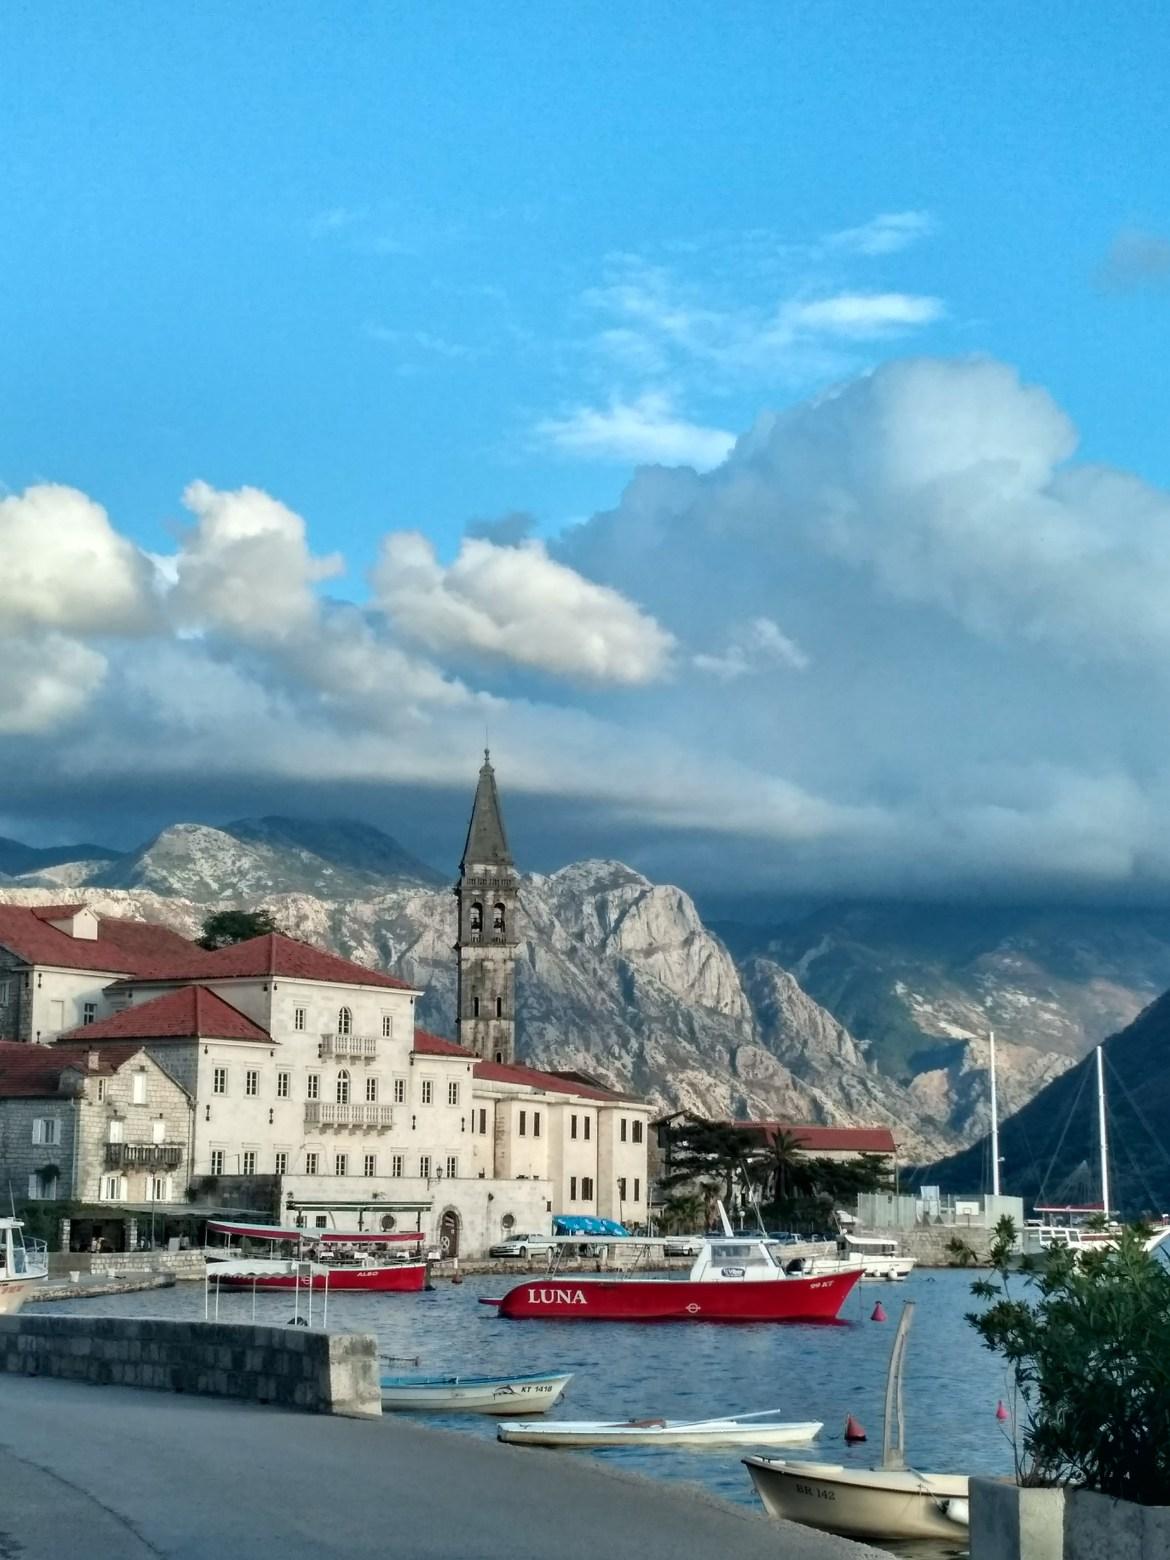 img 20170920 175251 hdr - Czarnogóra - perła na Bałkanach